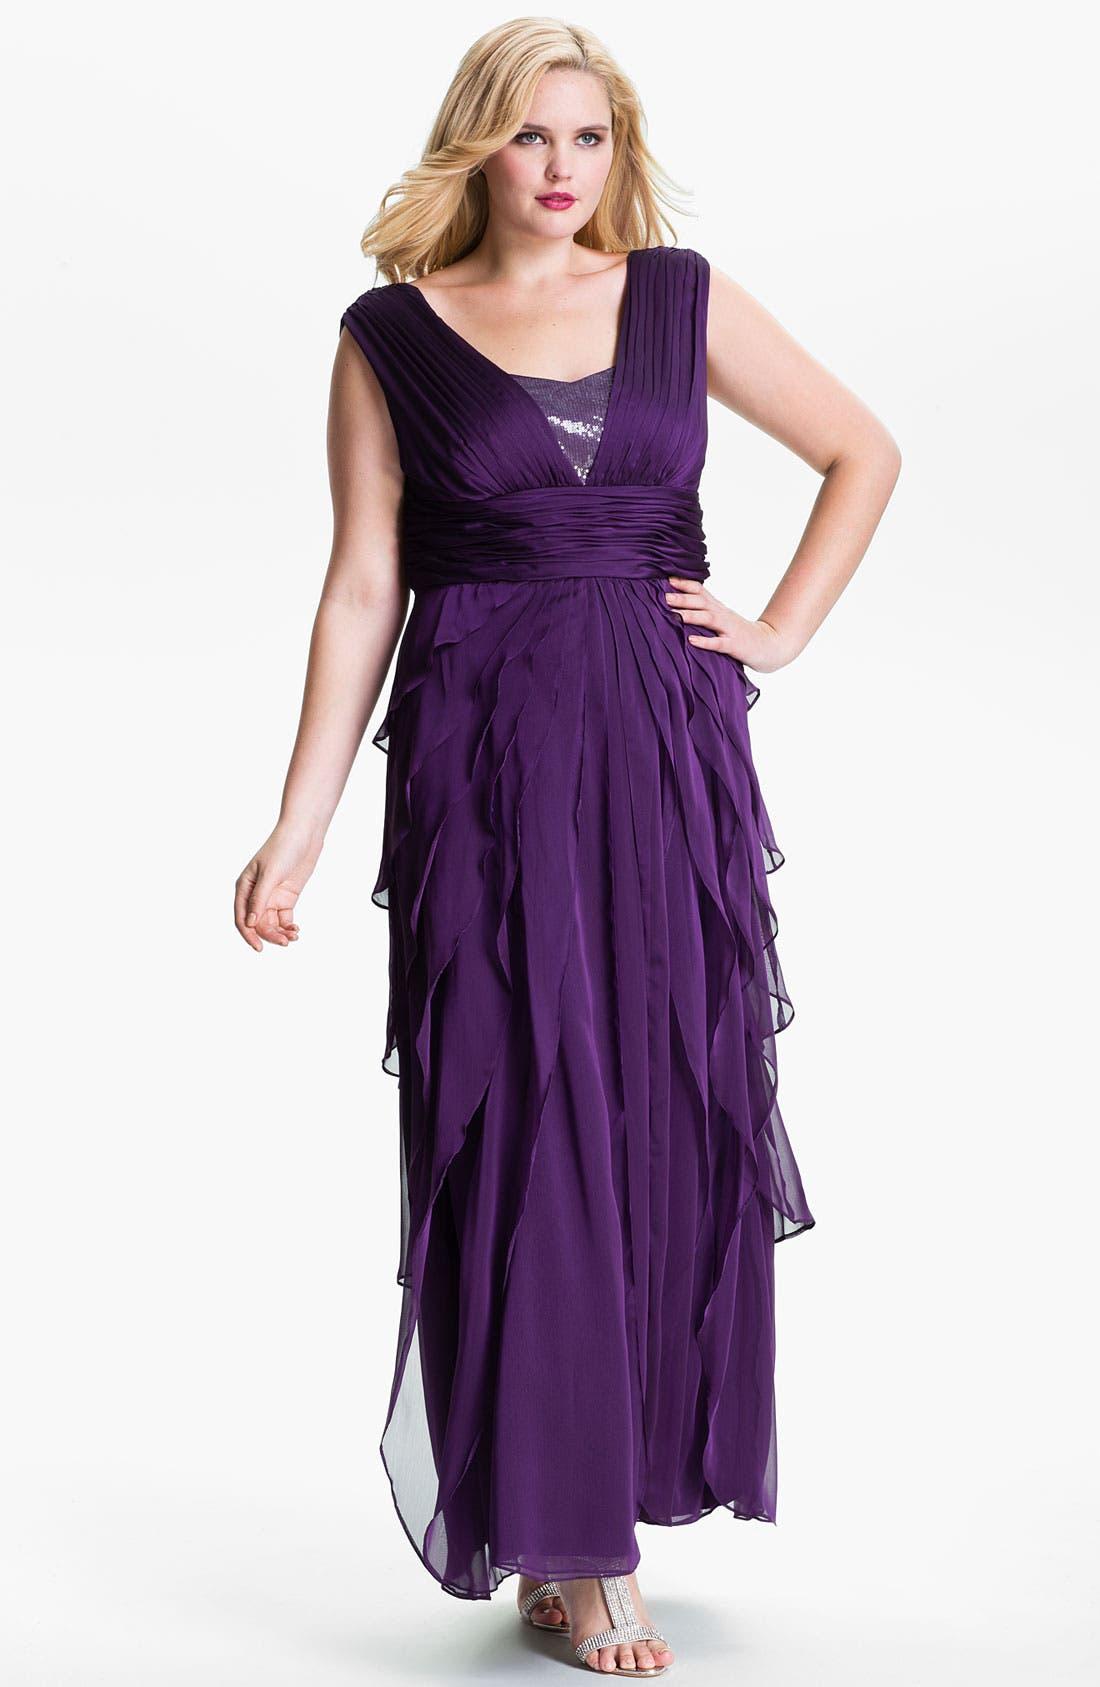 Main Image - Adrianna Papell Chiffon Petal Gown (Plus)